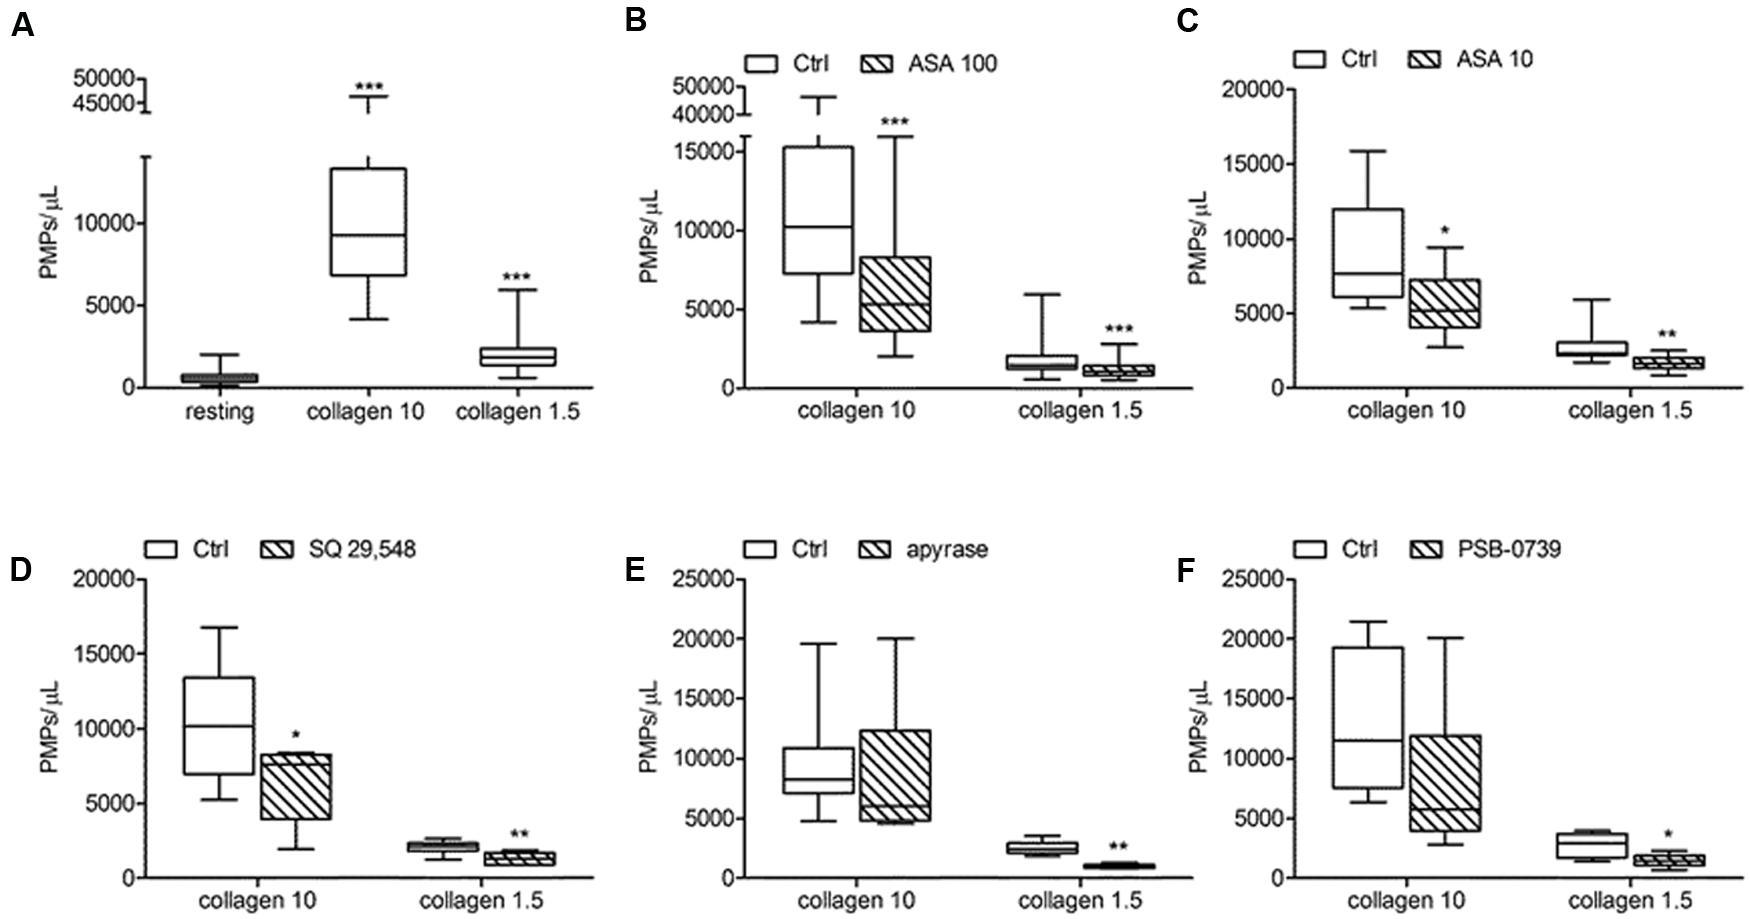 fphar 07 00314 g007 frontiers antiplatelet agents inhibit the generation of platelet